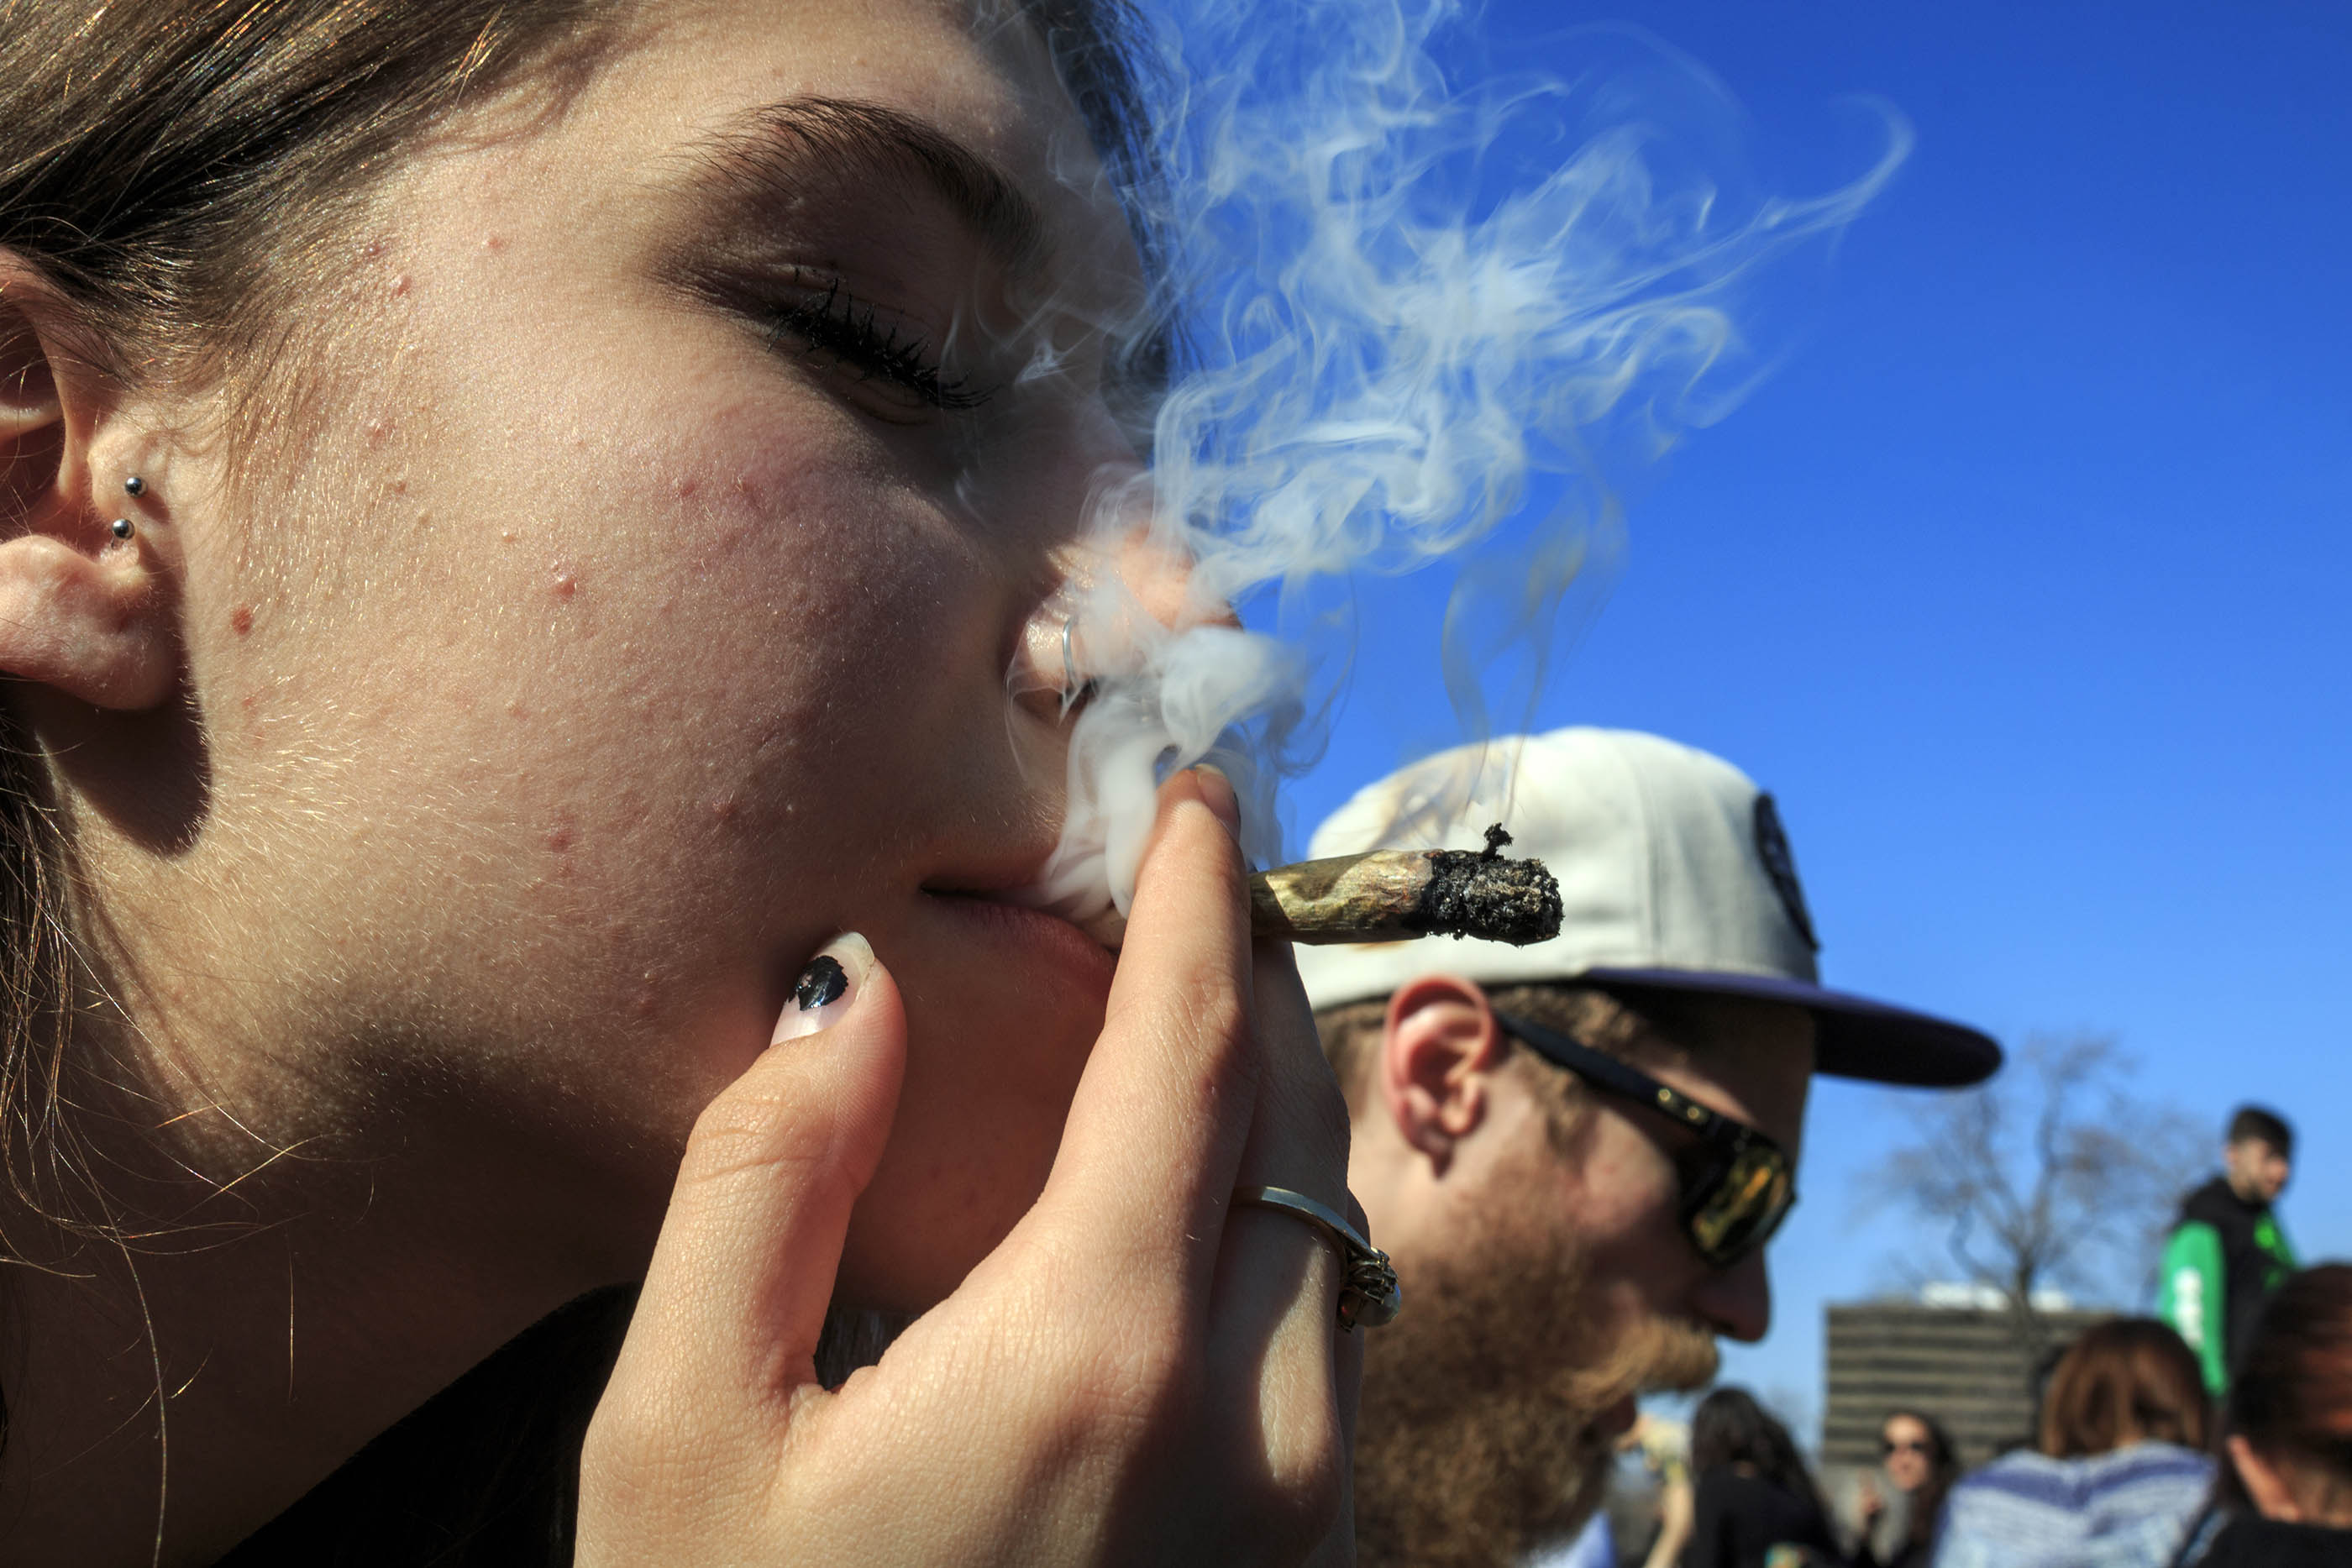 4/20 MONTREAL LOUIS GOBEILLE PHOTOS MARIJUANA POT WEED HERB CANNABIS SMOKING LEGALIZE IT